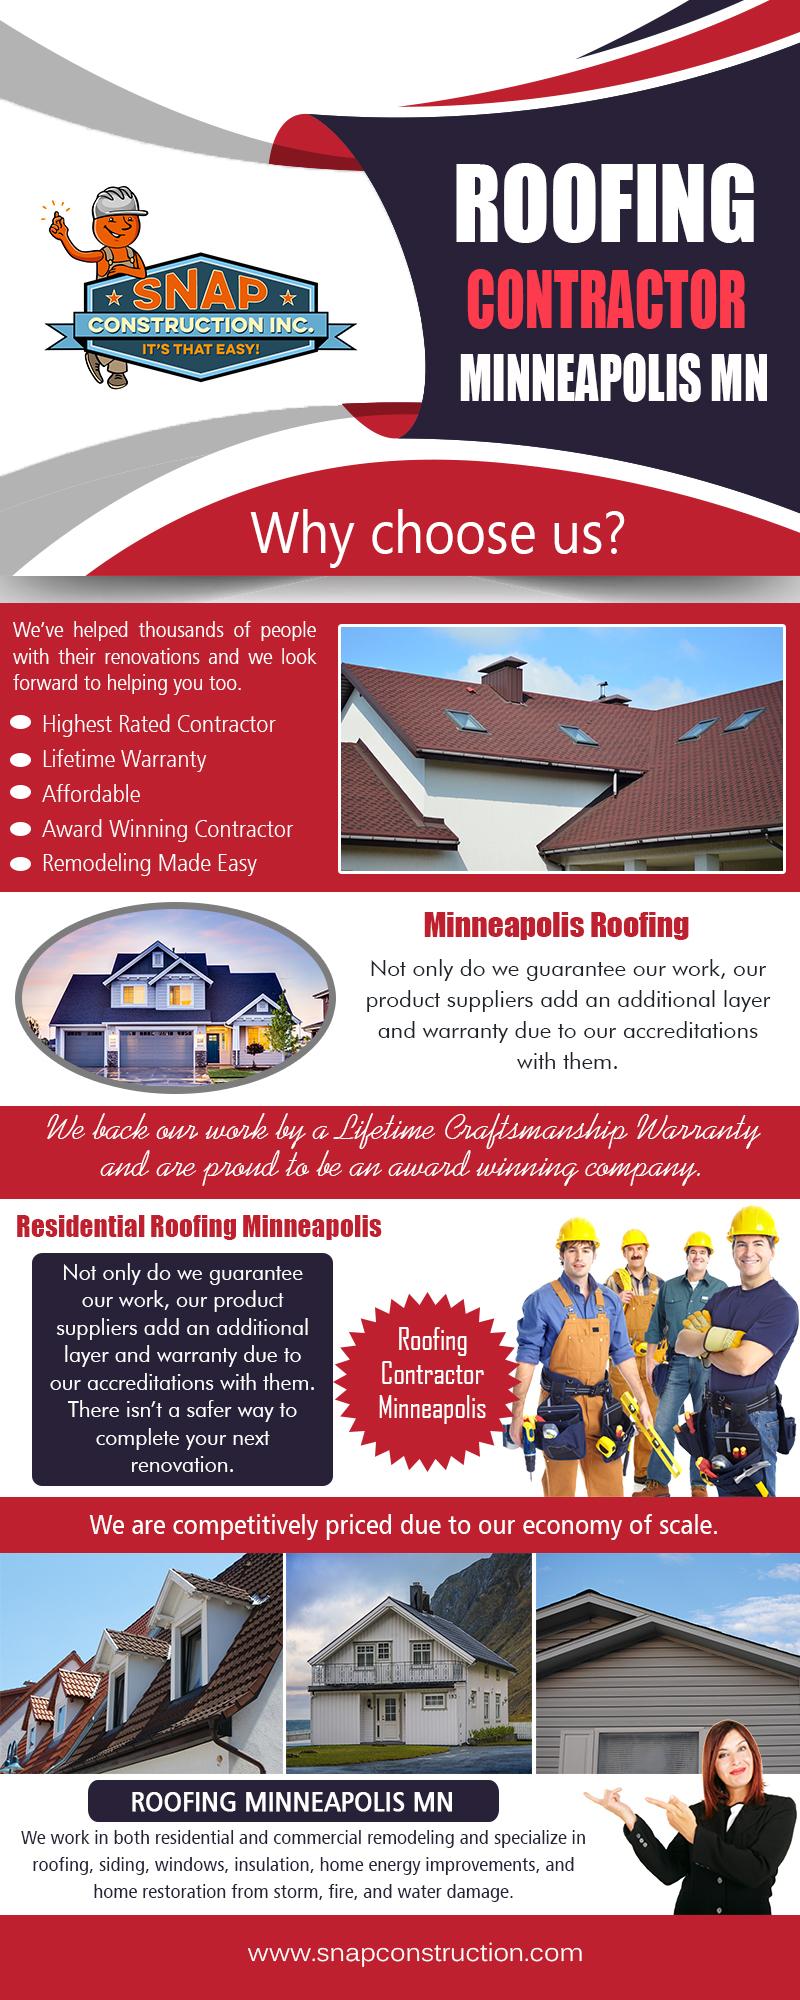 Roofing Contractor Minneapolis MN | snapconstruction.com